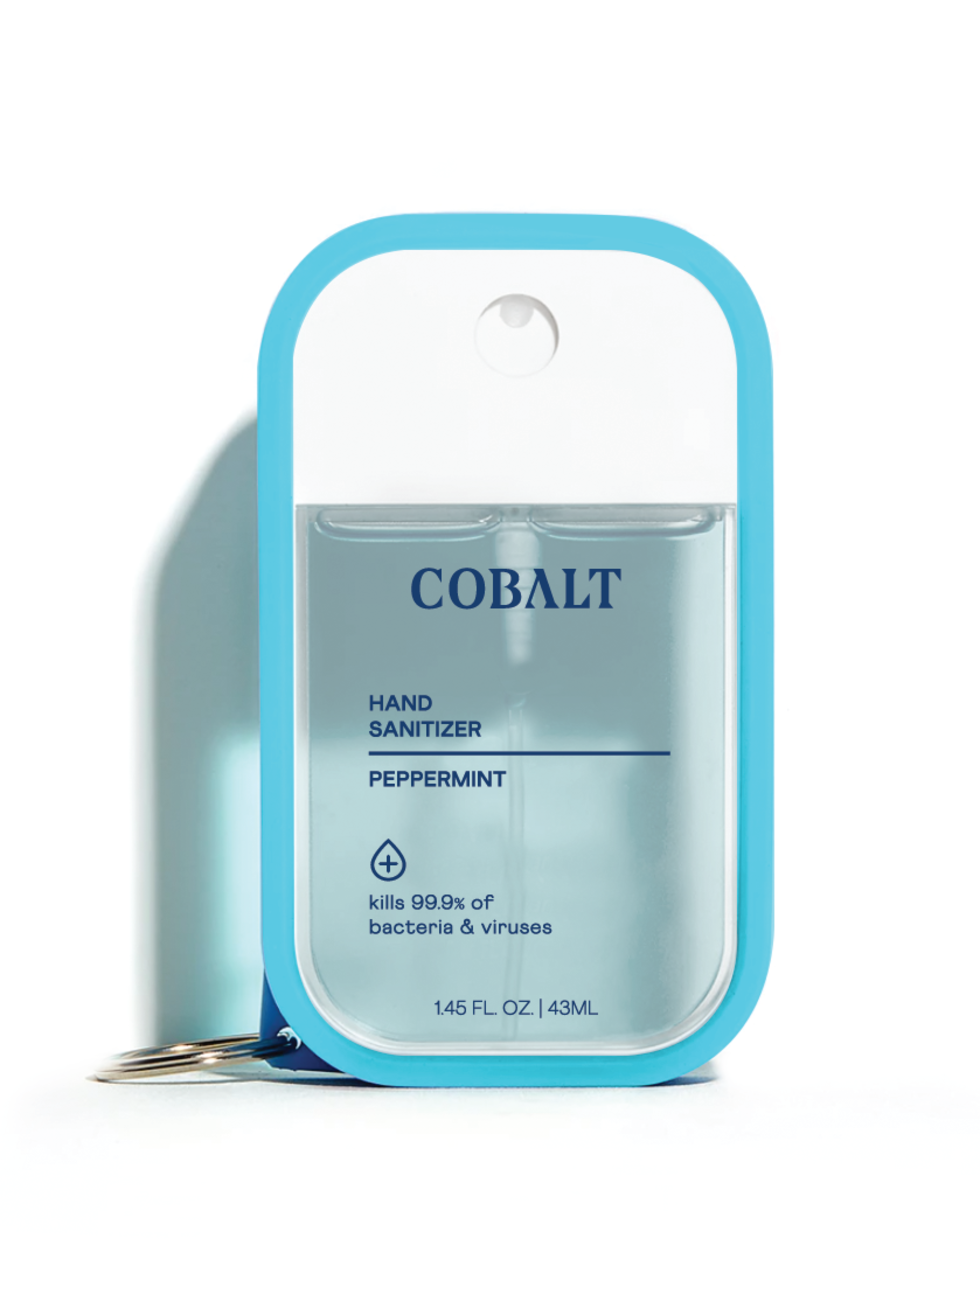 Cobalt hand sanitizer Peppermint clip-on